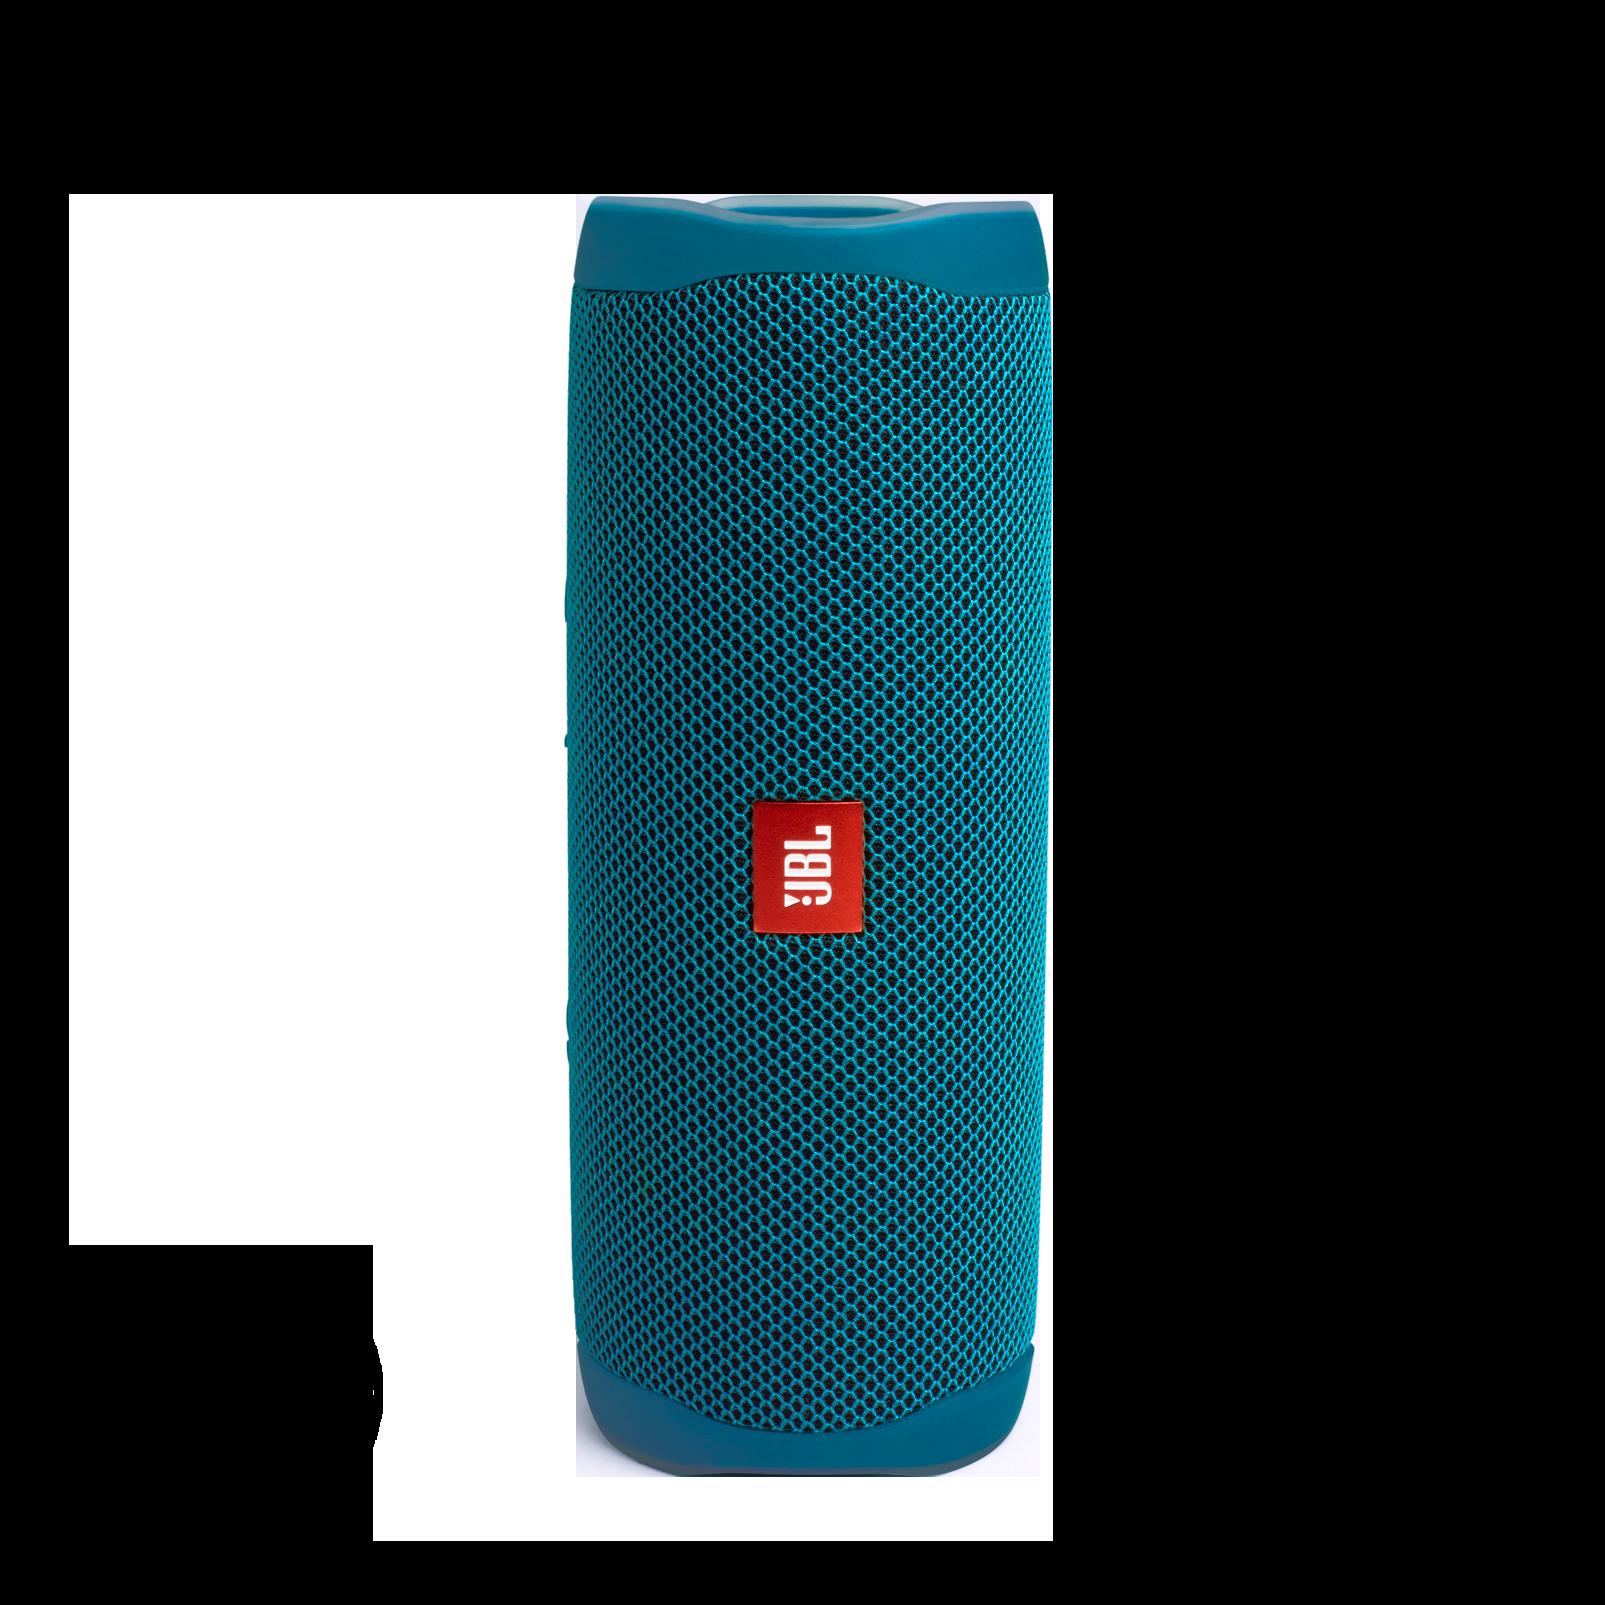 JBL Flip 5 Eco edition - Ocean Blue - Portable Speaker - Eco edition - Hero